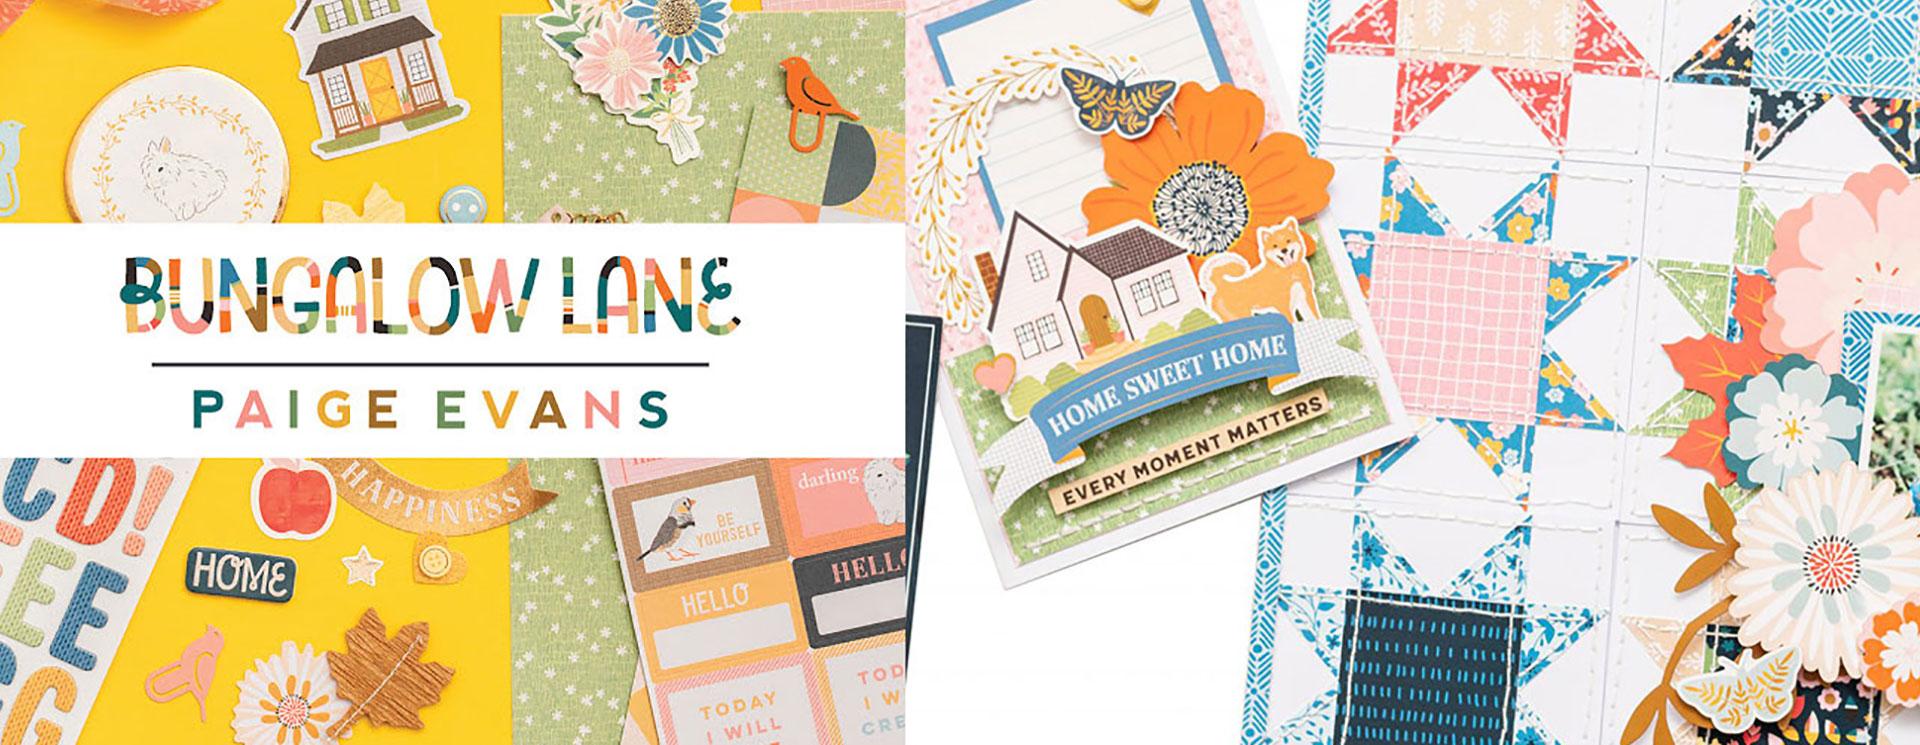 Bungalow Lane Papercraft Collection